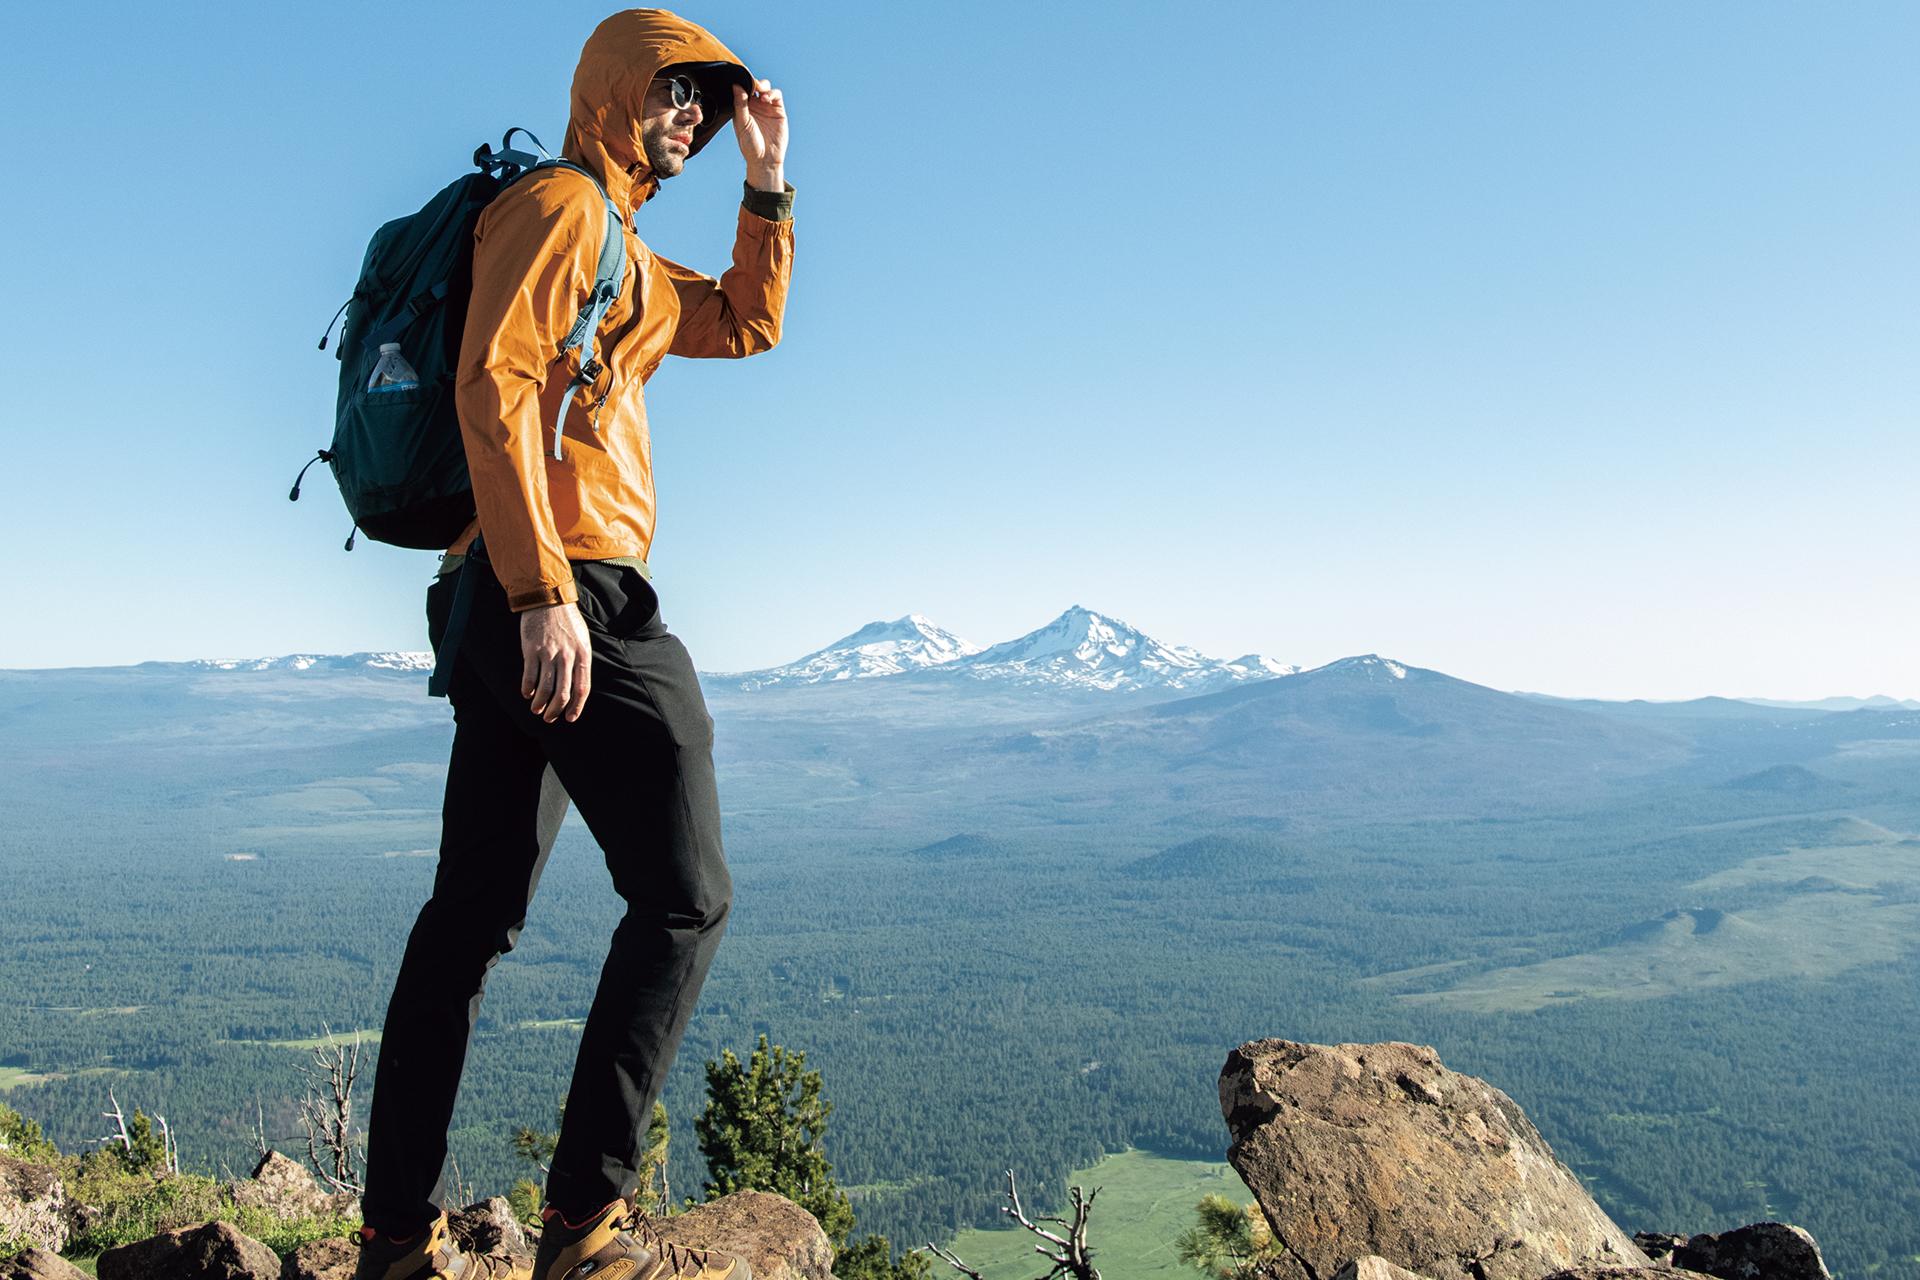 main-F18_7330_mountainsarecalling_high_main 【レインウェア10選】登山からハイキング・ライトアウトドア、ビジネスまで、メンズ・ウィメンズのシーン&目的別レインウェア